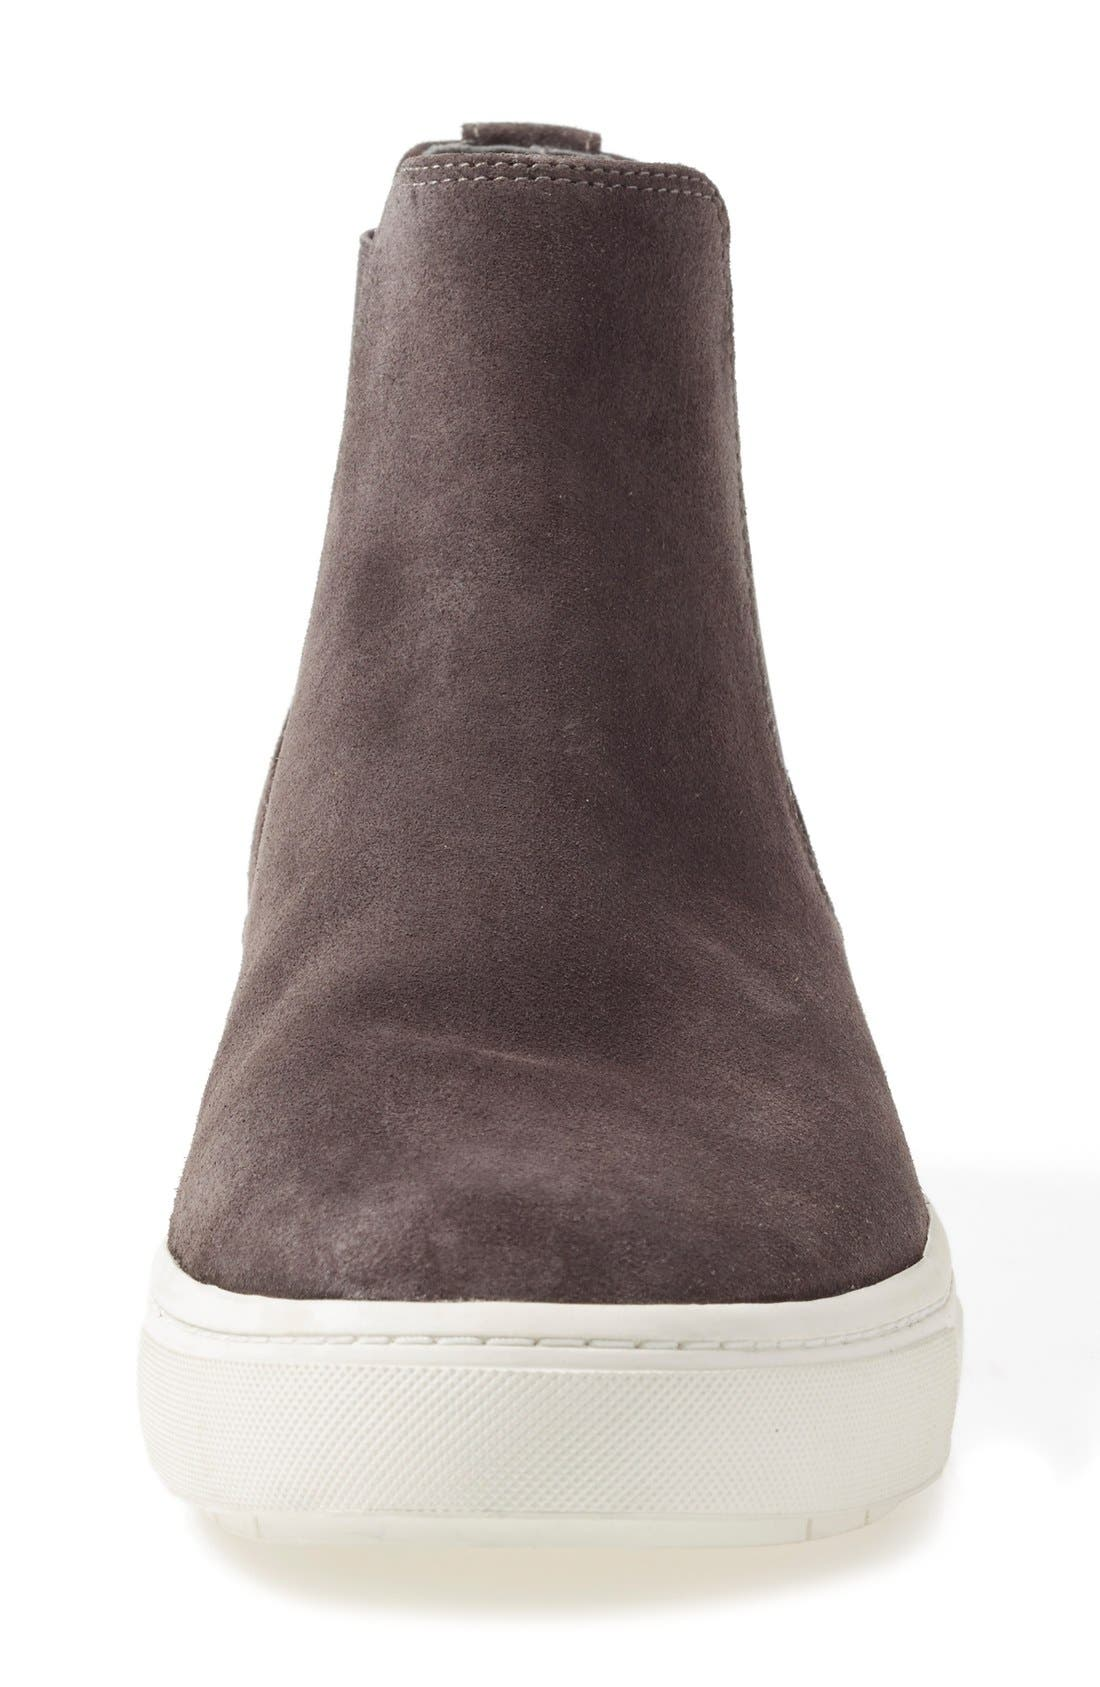 Newlyn High Top Sneaker,                             Alternate thumbnail 18, color,